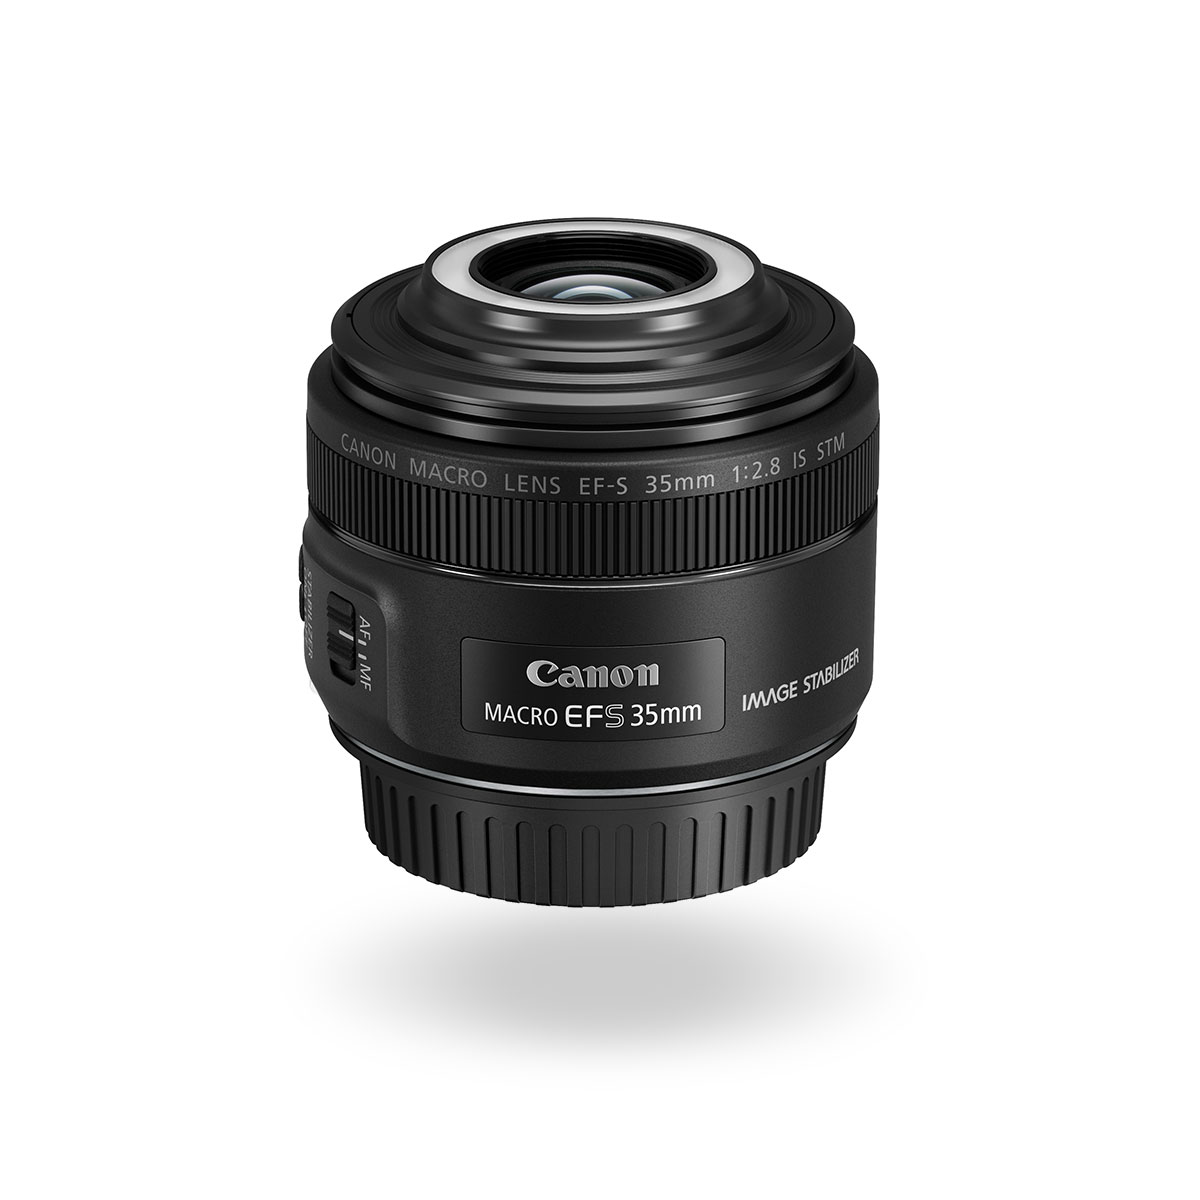 EF-S 60mm f/2.8 Macro USM lens